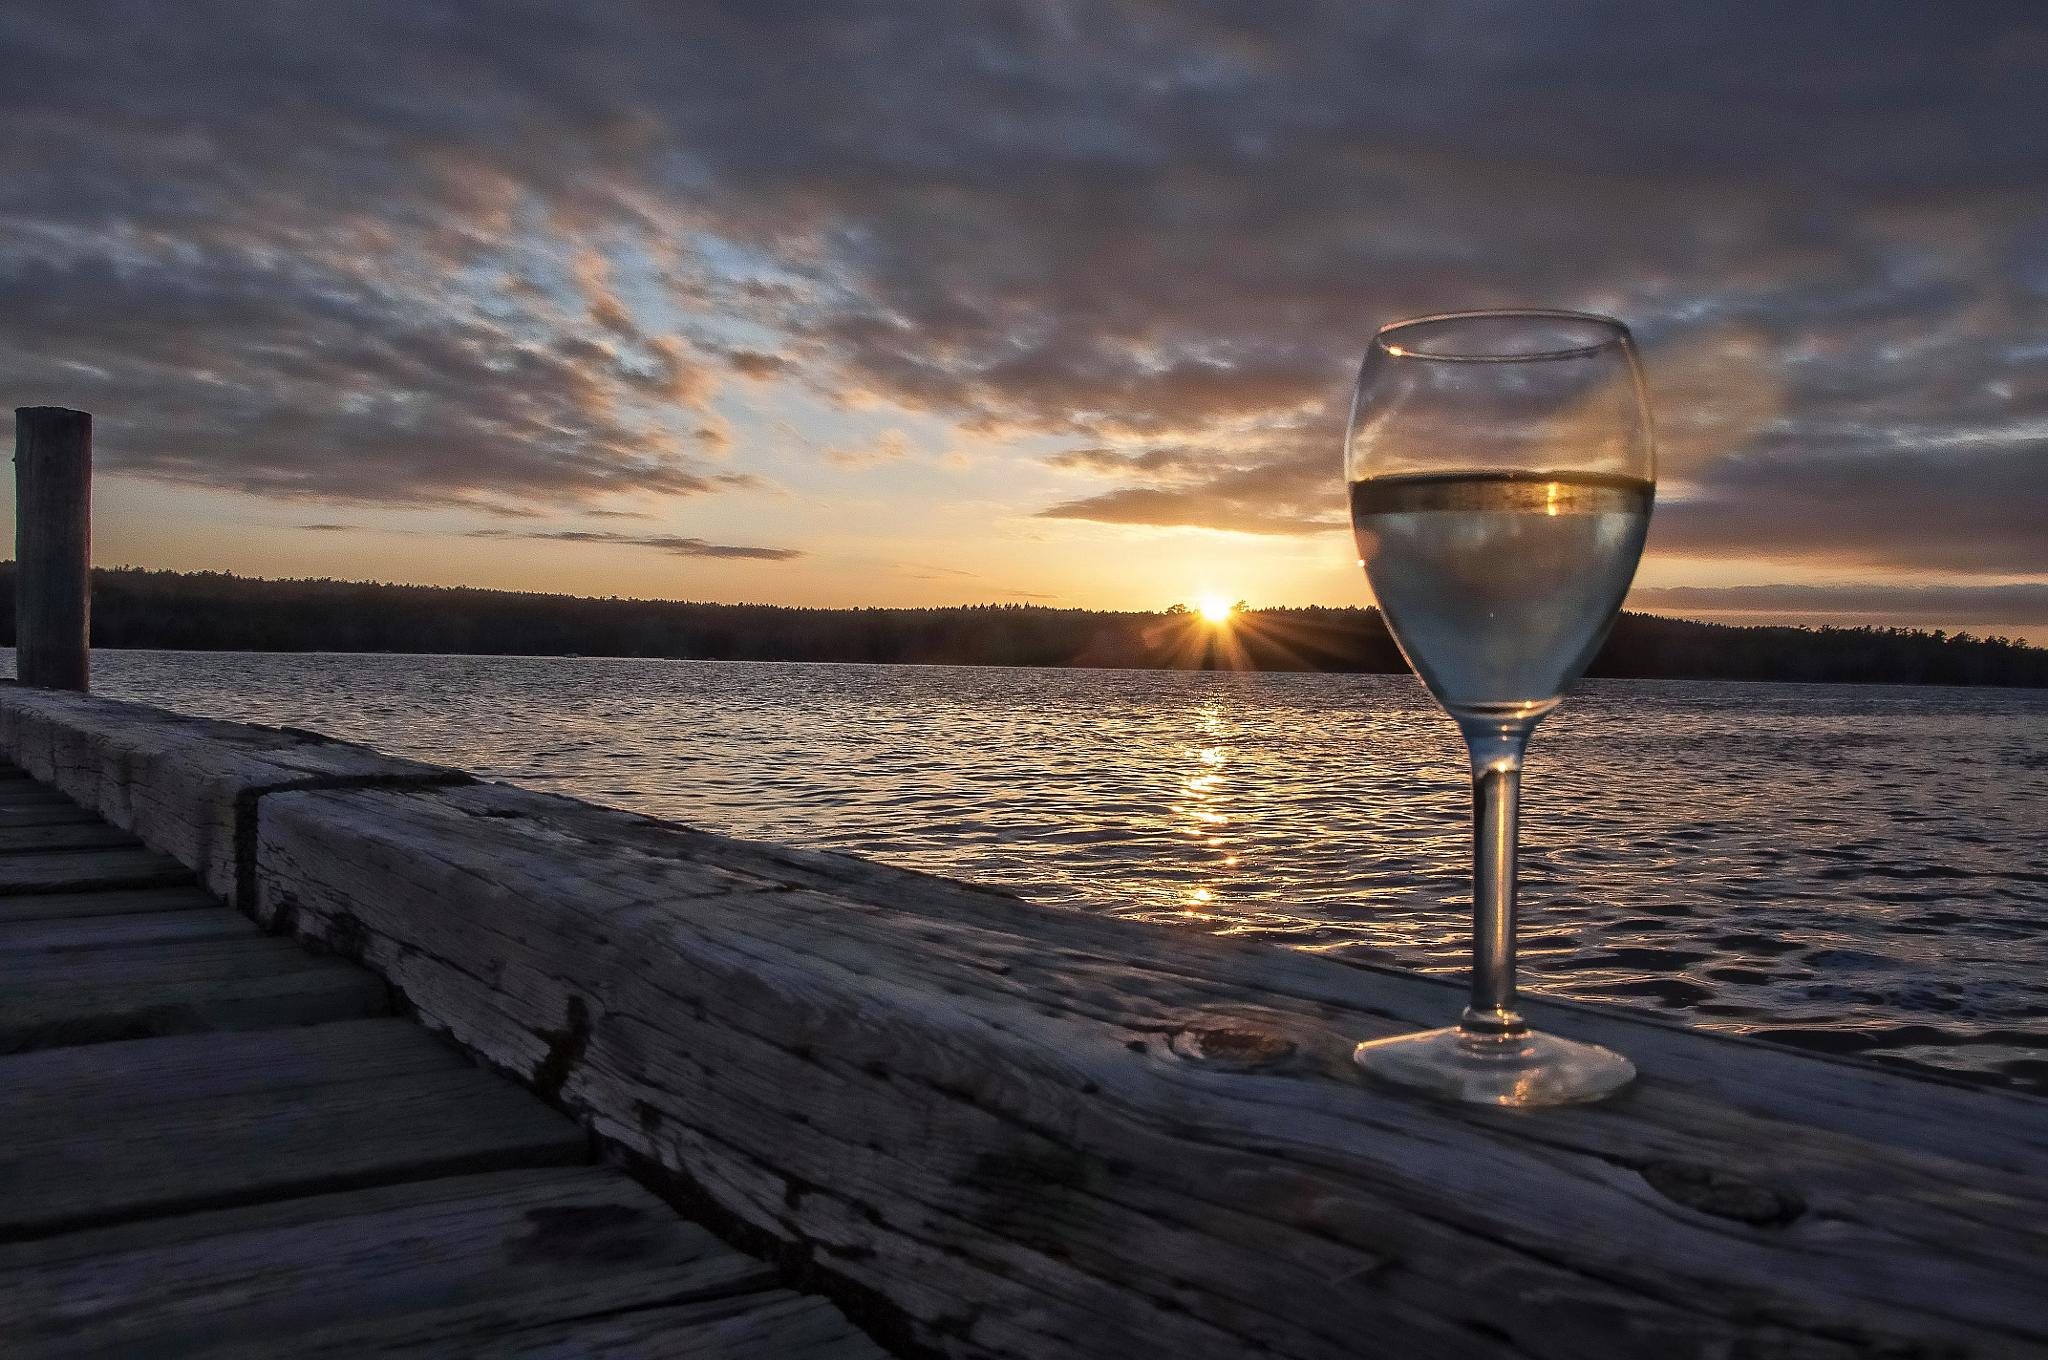 Sunset wine by paulhamilton969952